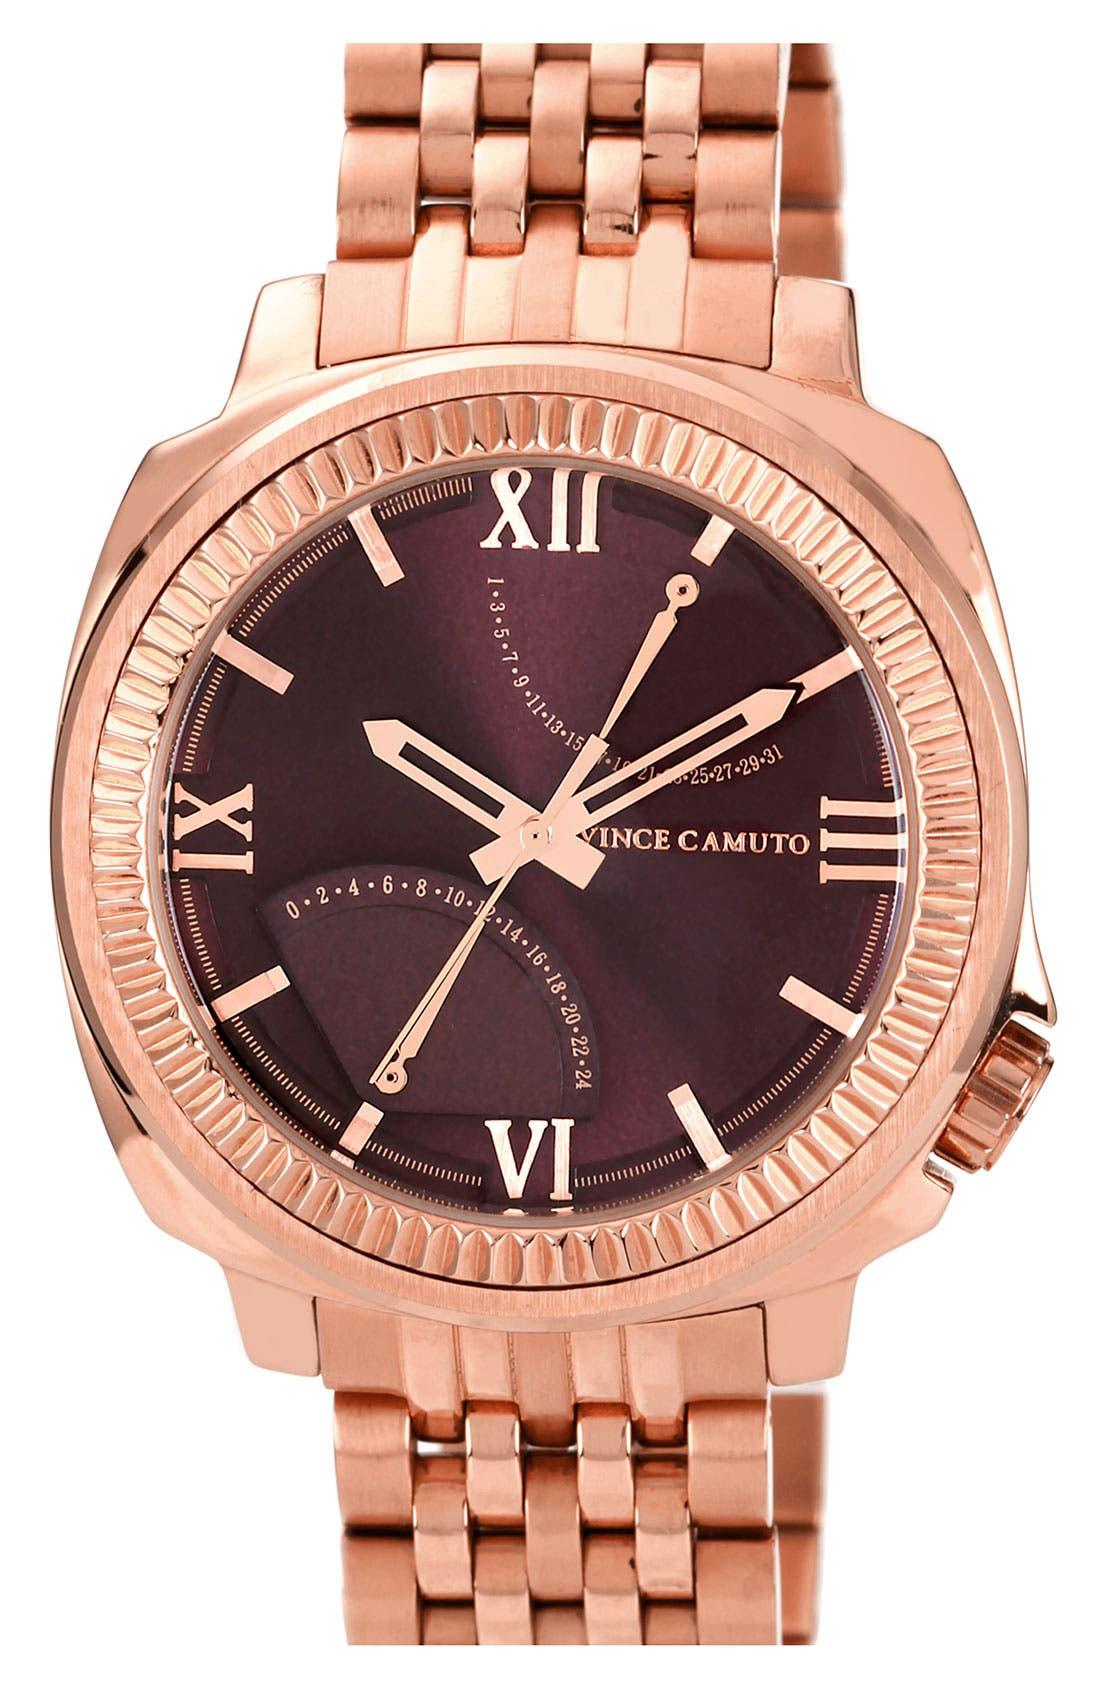 Alternate Image 1 Selected - Vince Camuto Flyback Dial Bracelet Watch, 43mm